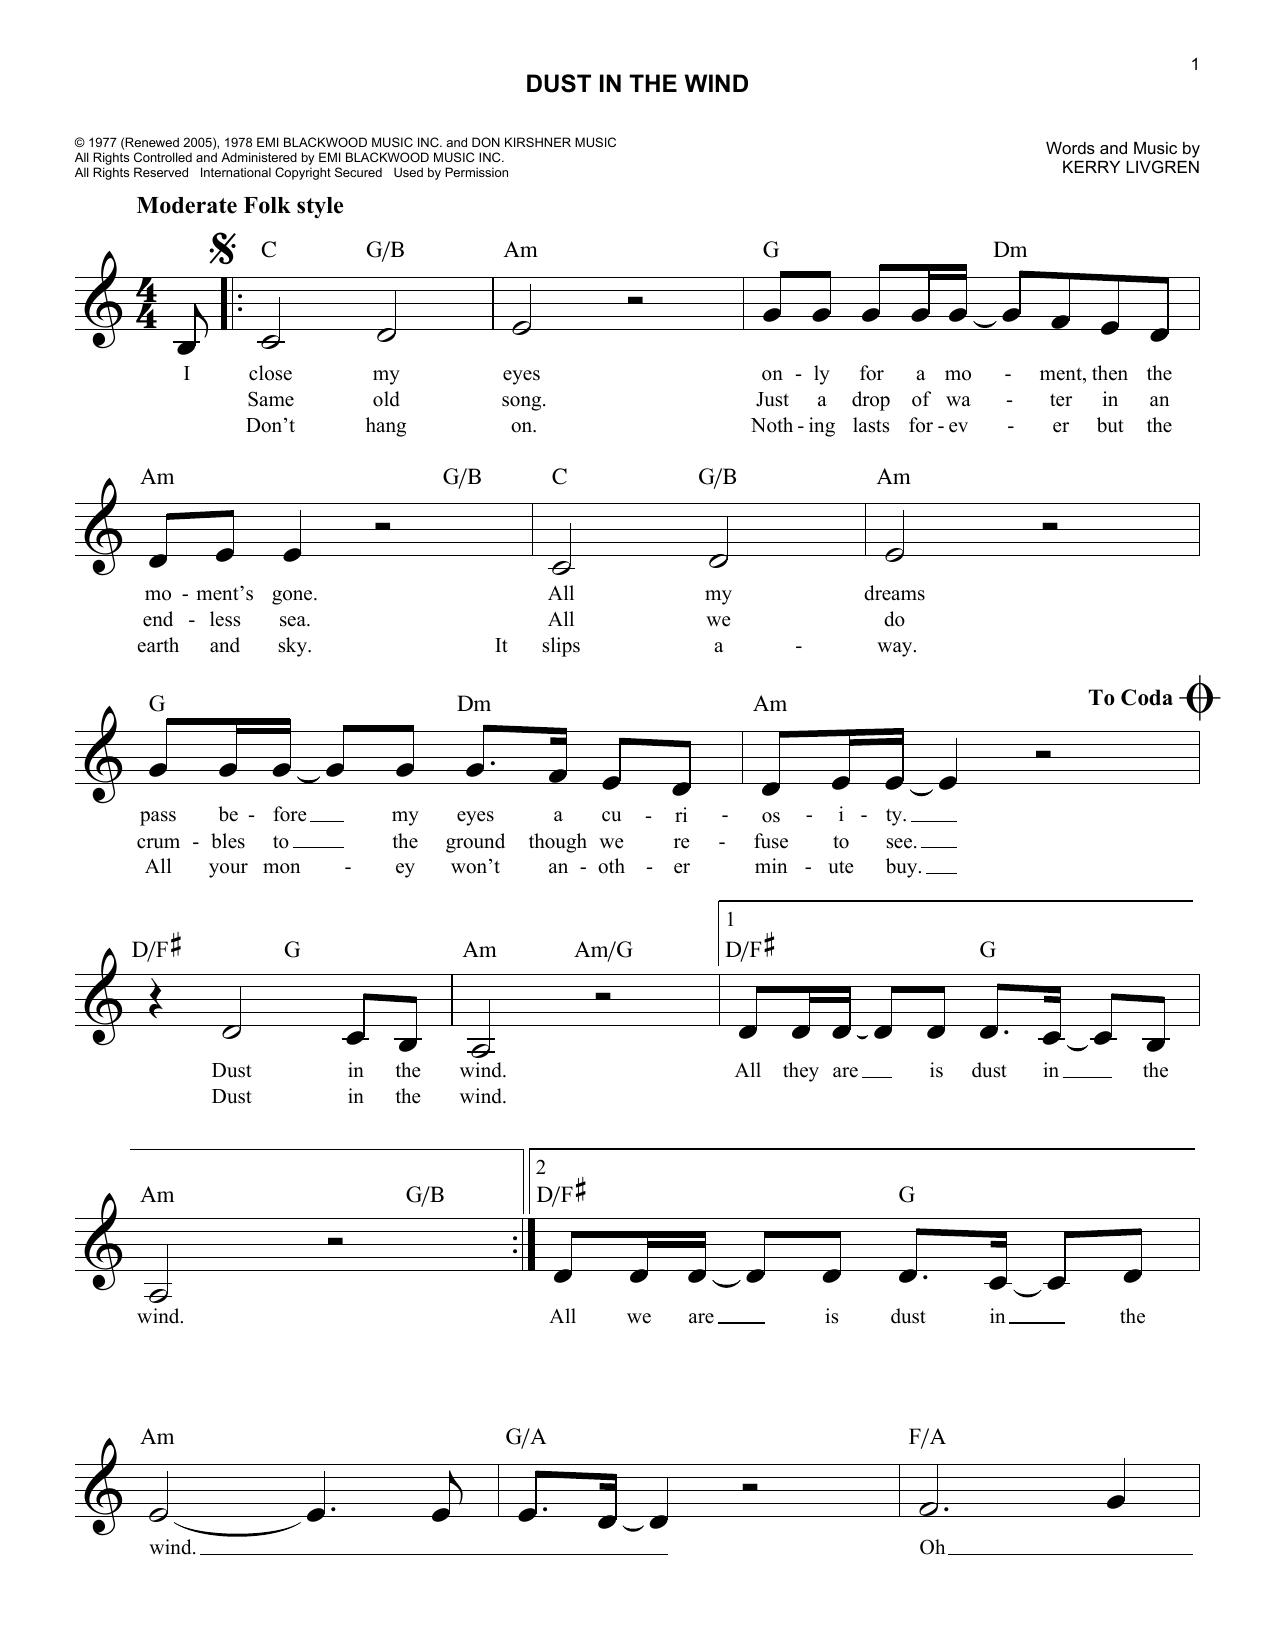 Dust In The Wind Chords Sheet Music Digital Files To Print Licensed Kansas Digital Sheet Music